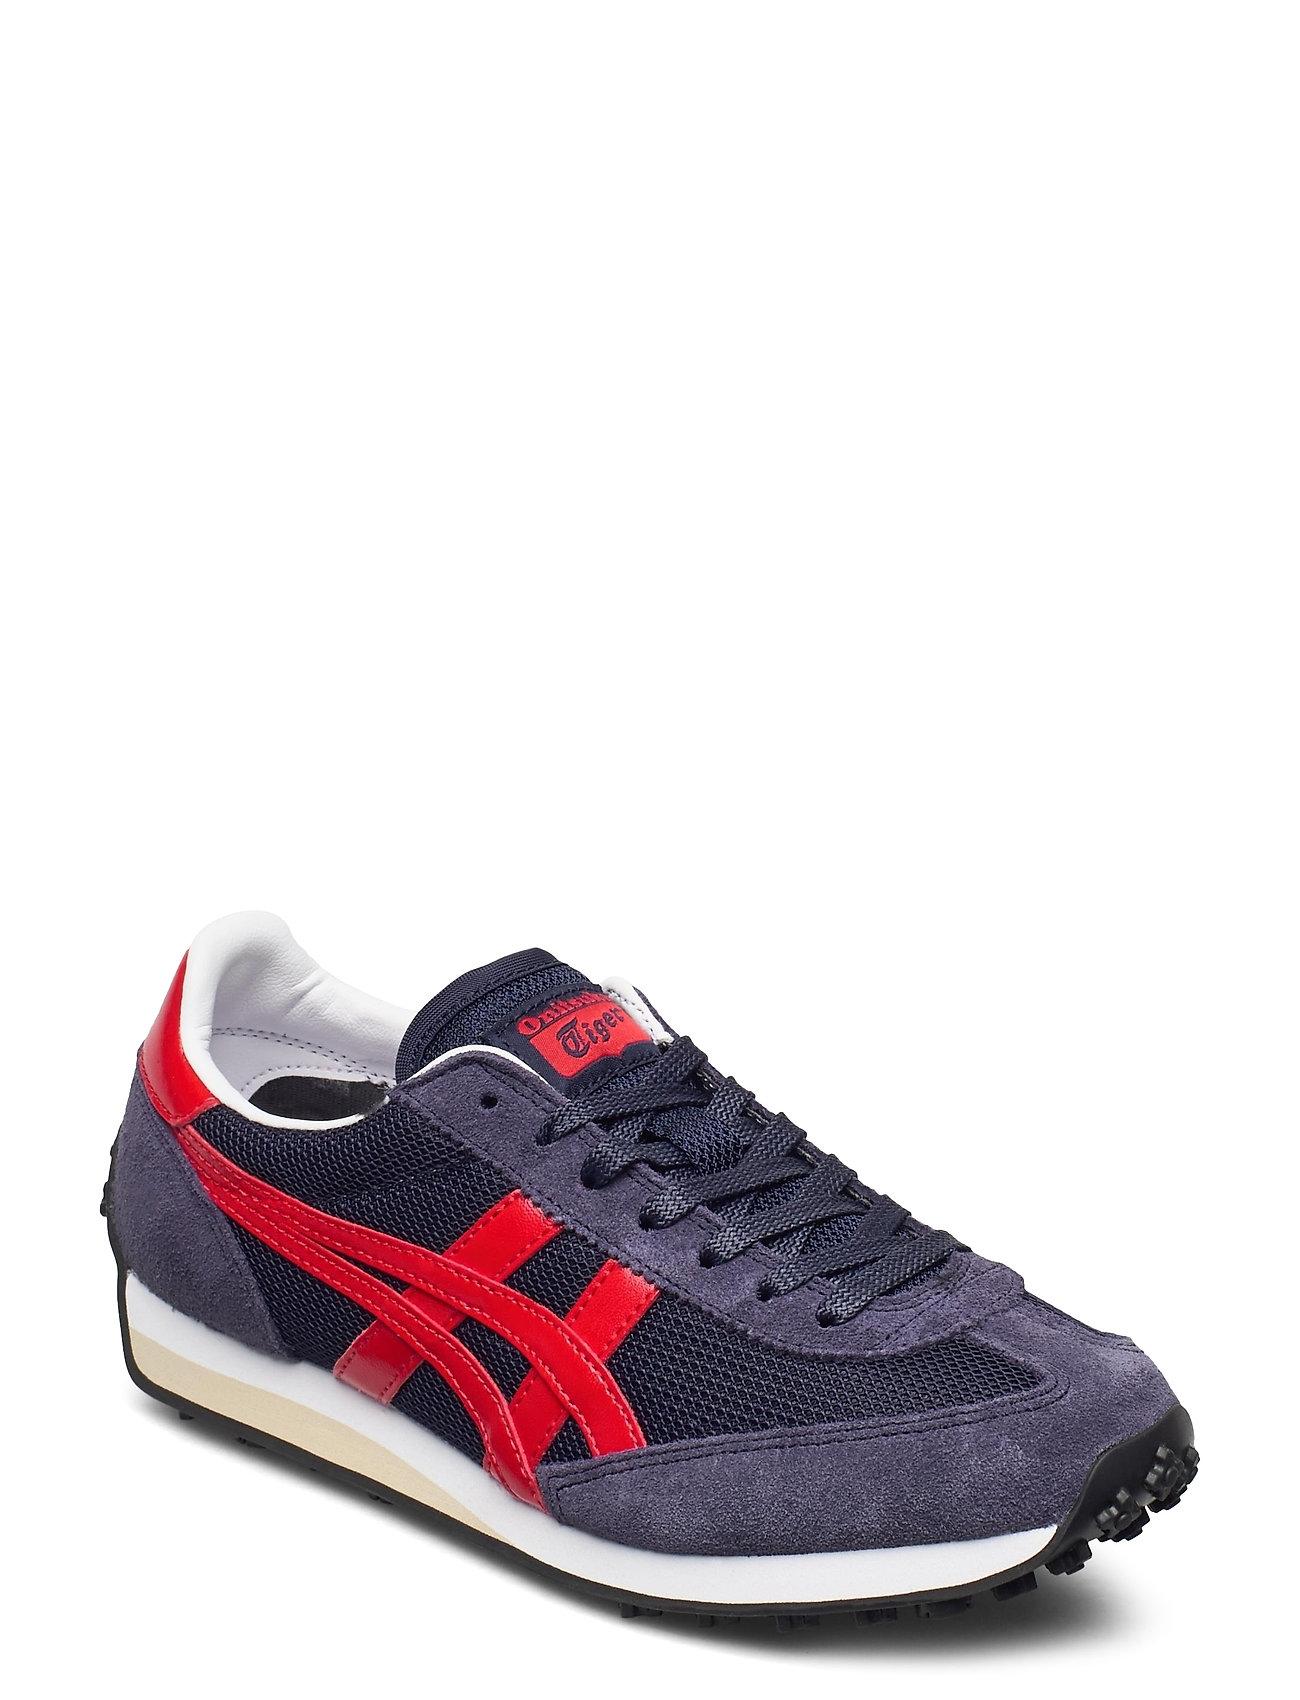 Image of Edr 78 Low-top Sneakers Blå Onitsuka Tiger (3488472981)